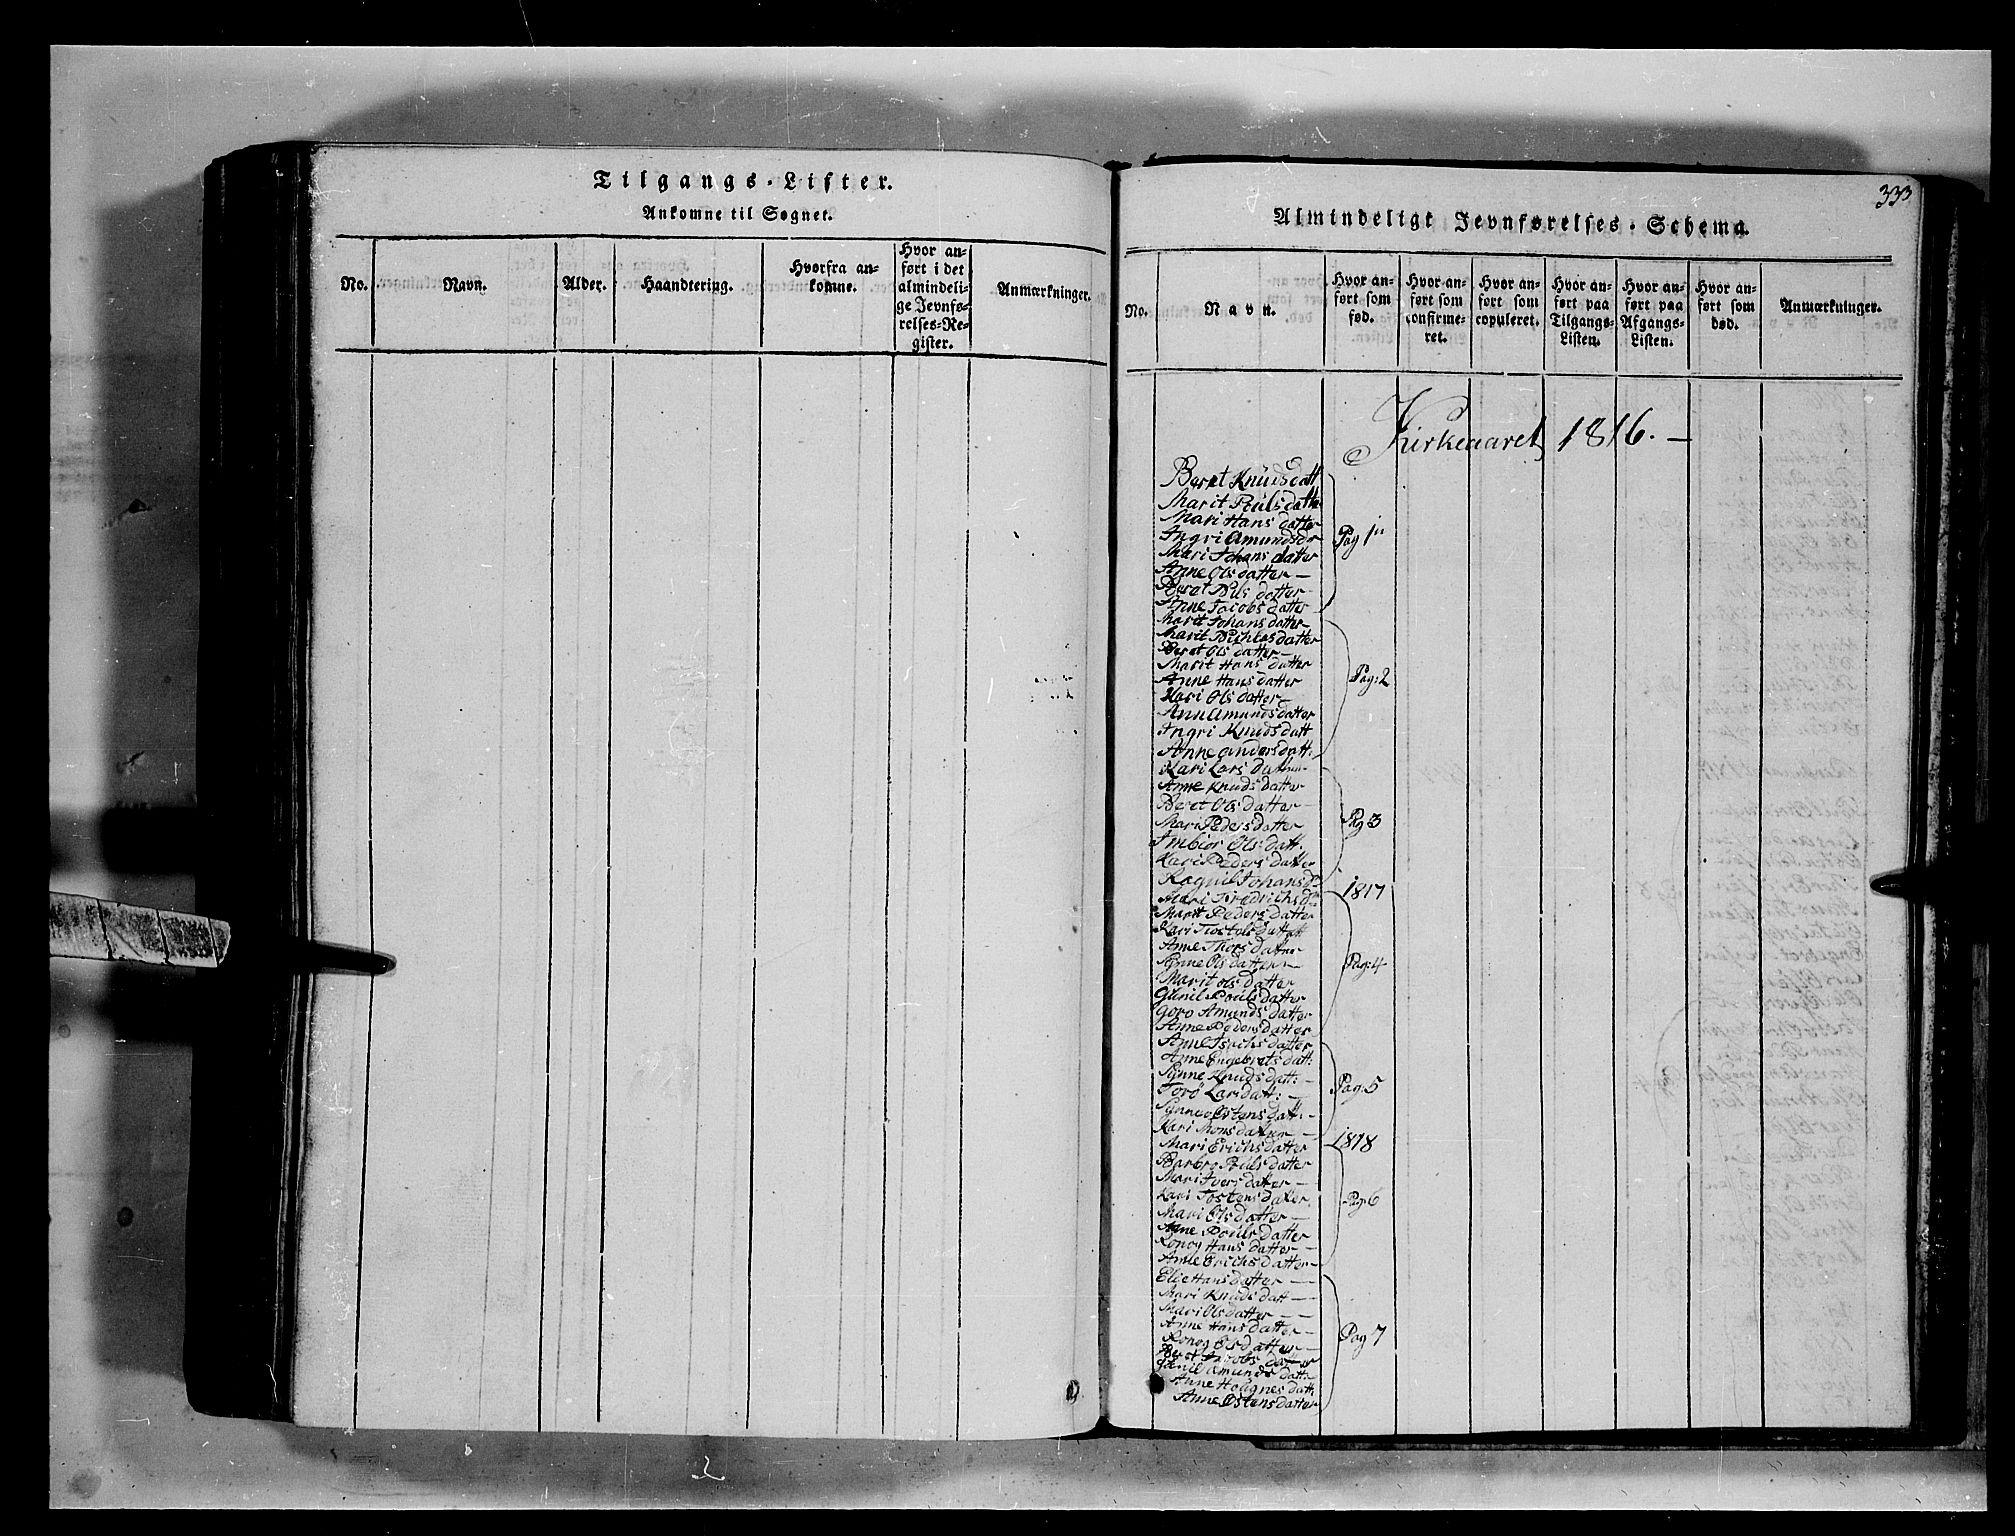 SAH, Fron prestekontor, H/Ha/Hab/L0002: Klokkerbok nr. 2, 1816-1850, s. 333